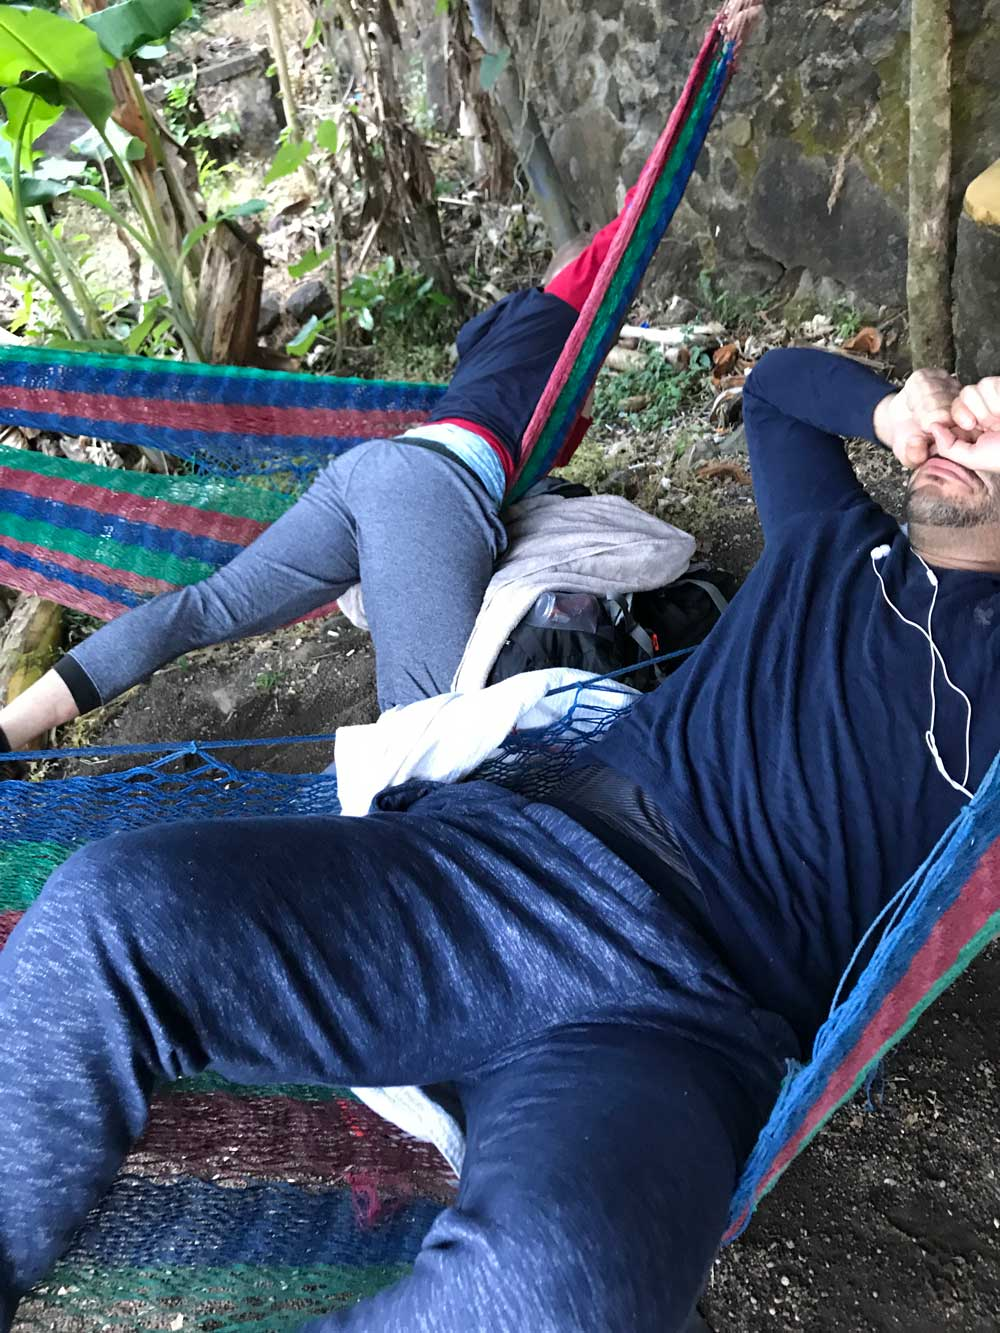 travel-nicaragua-hostel-backpack.jpg